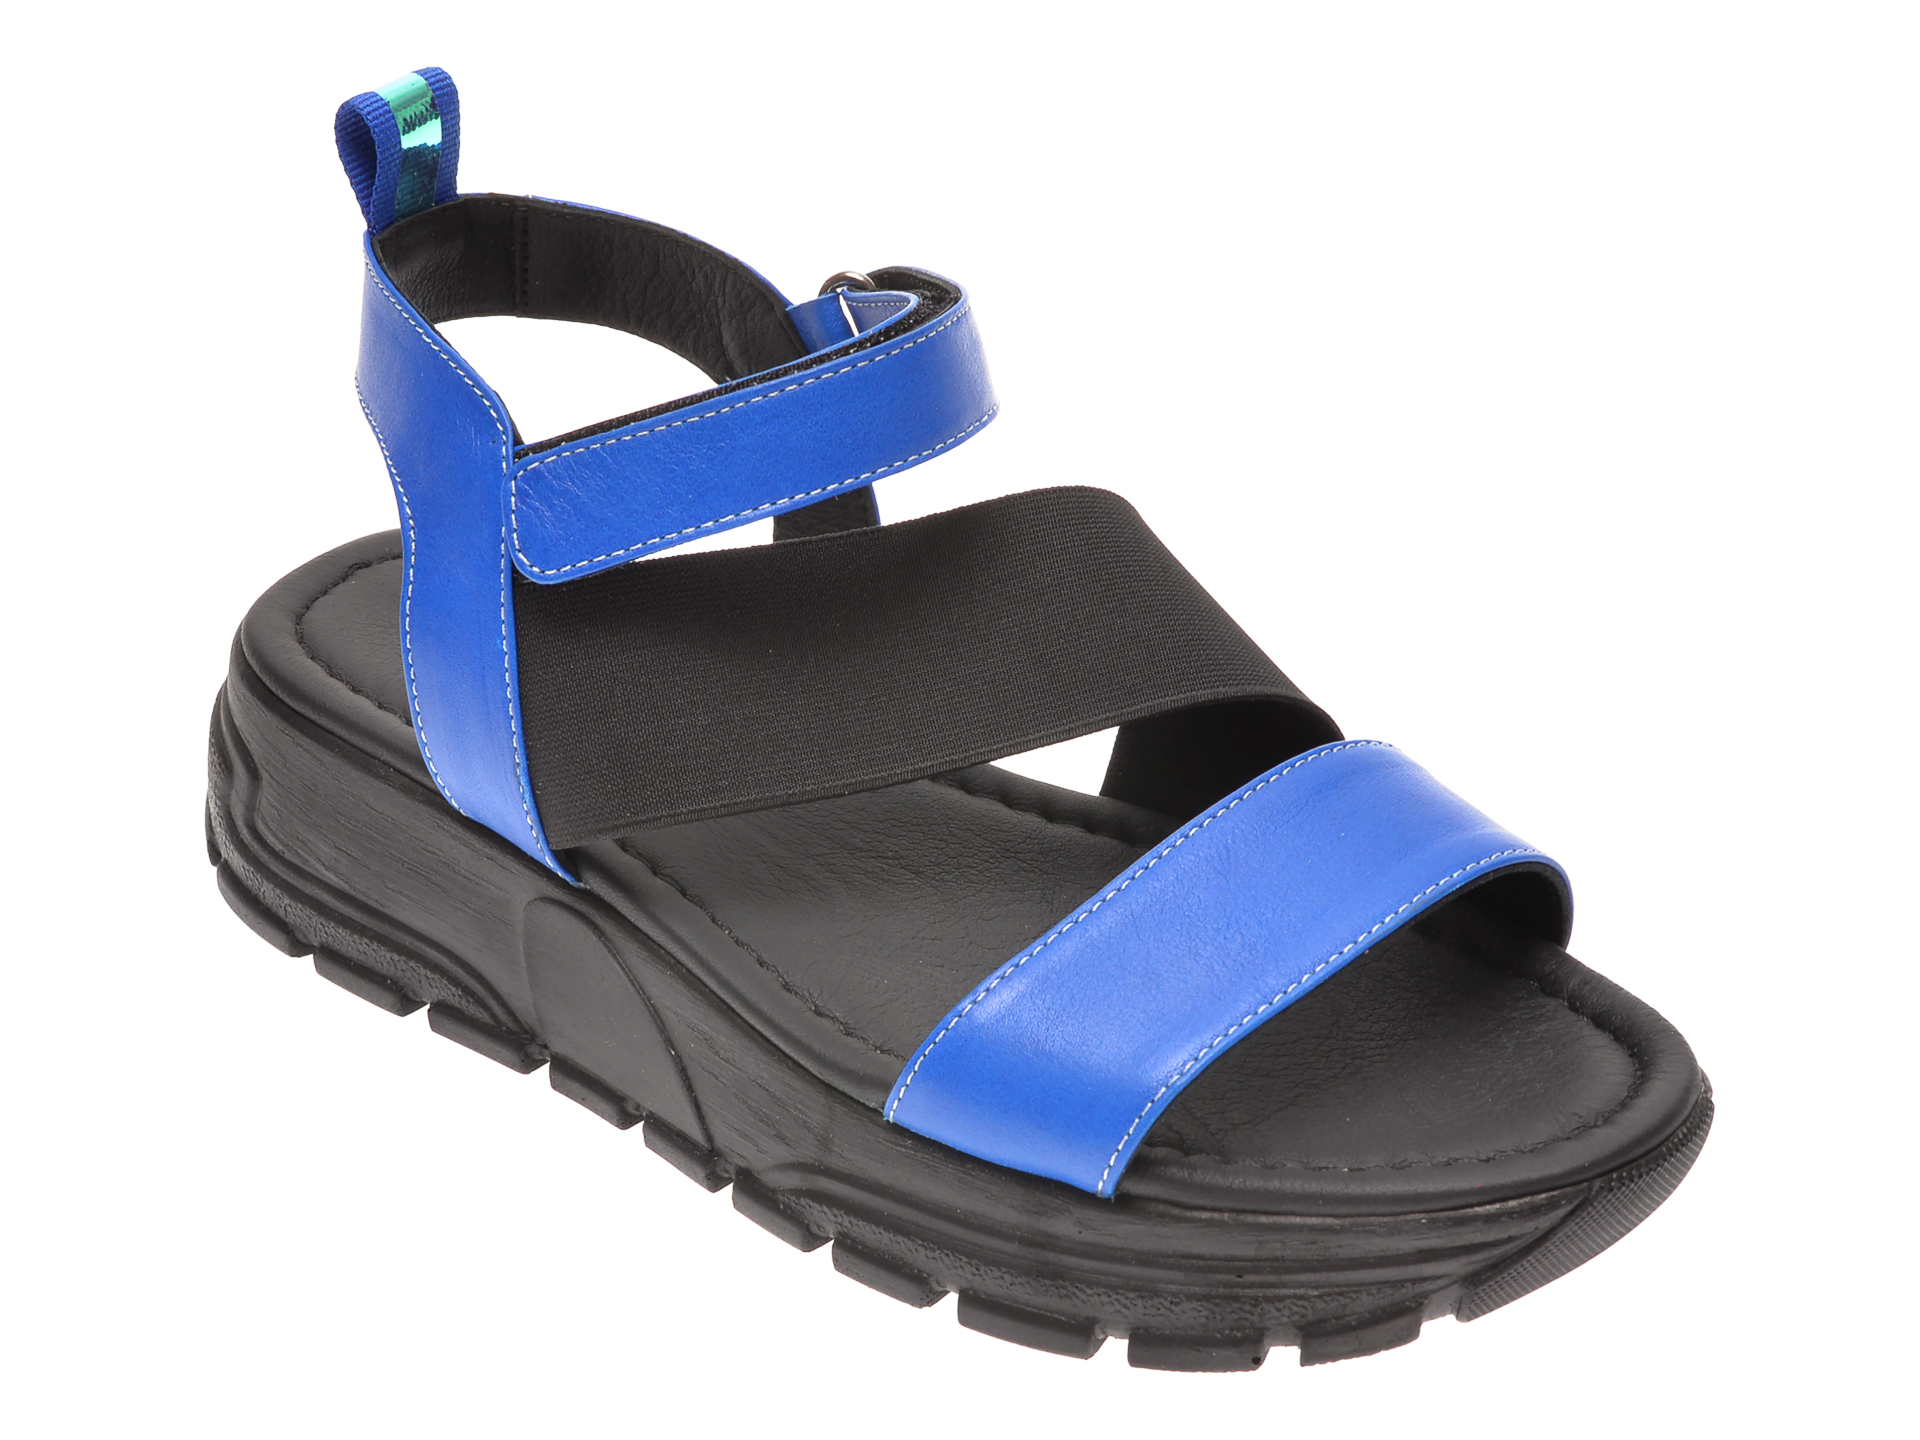 Sandale FLAVIA PASSINI albastre, 0021671, din piele naturala